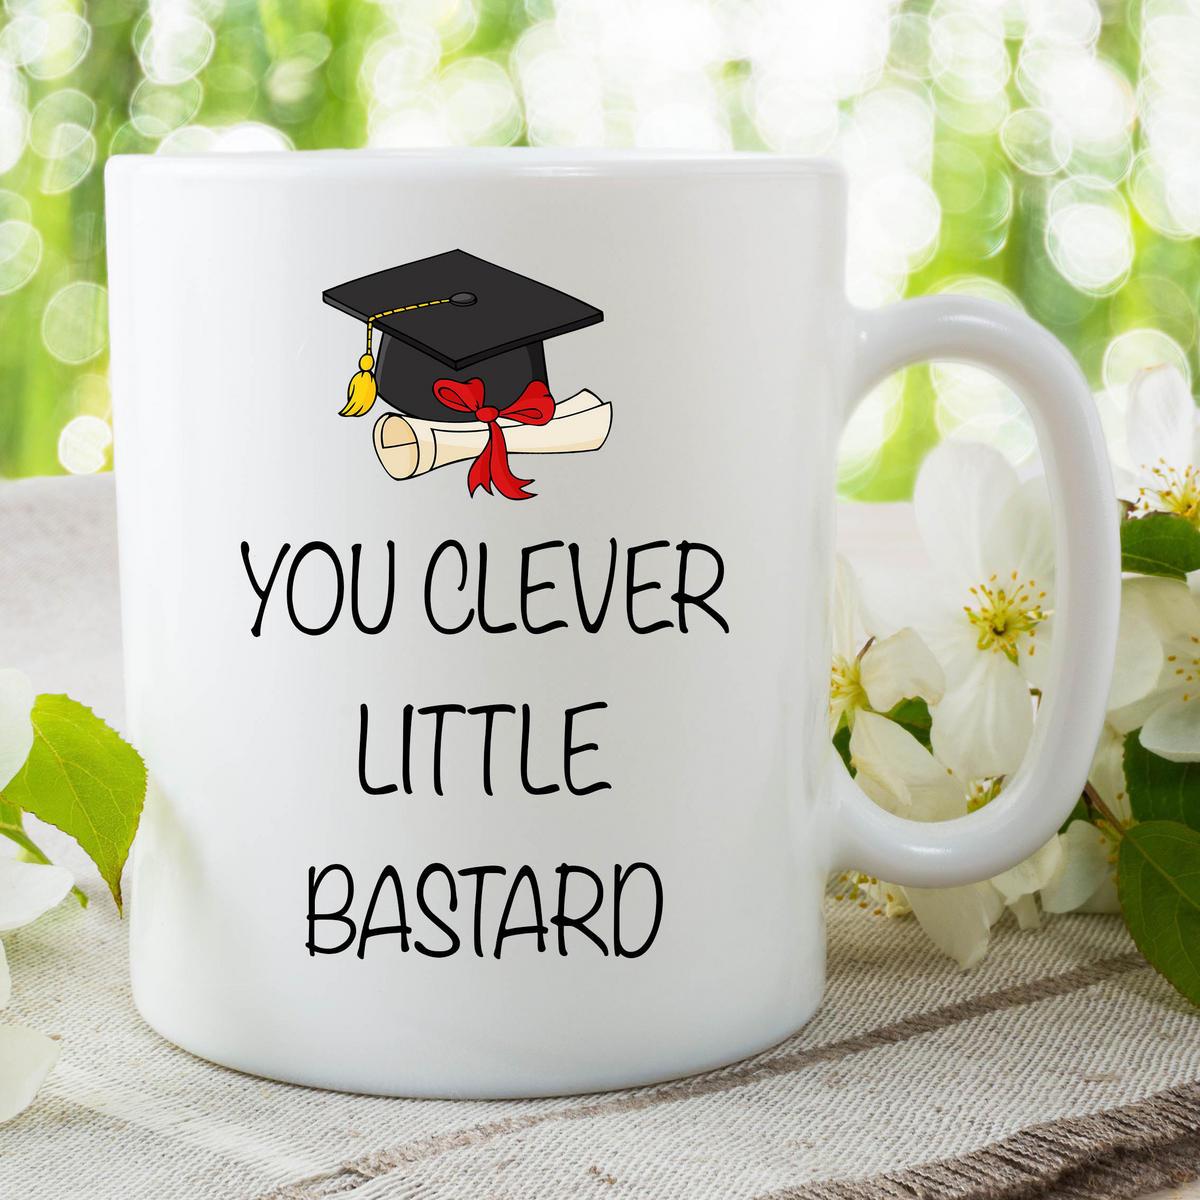 Funny Novelty Mug Adult Offensive Graduation Student Ceramic Cup Gift WSDMUG29